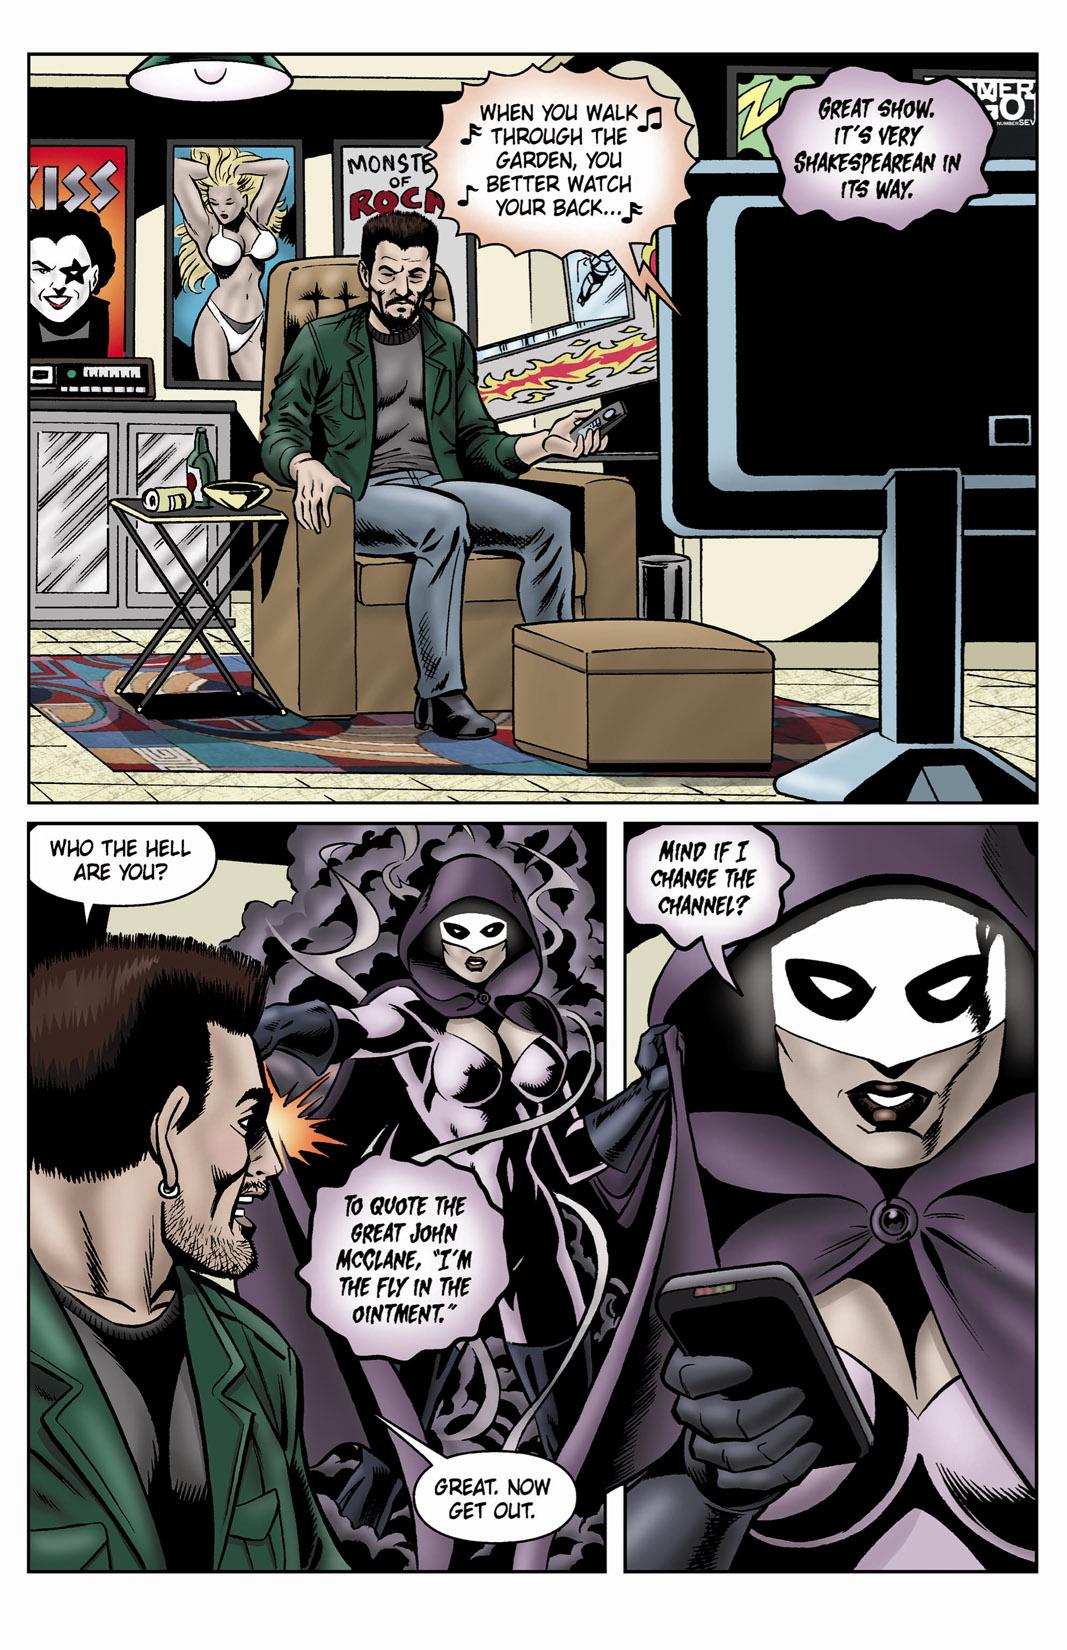 Read online SideChicks comic -  Issue #4 - 31